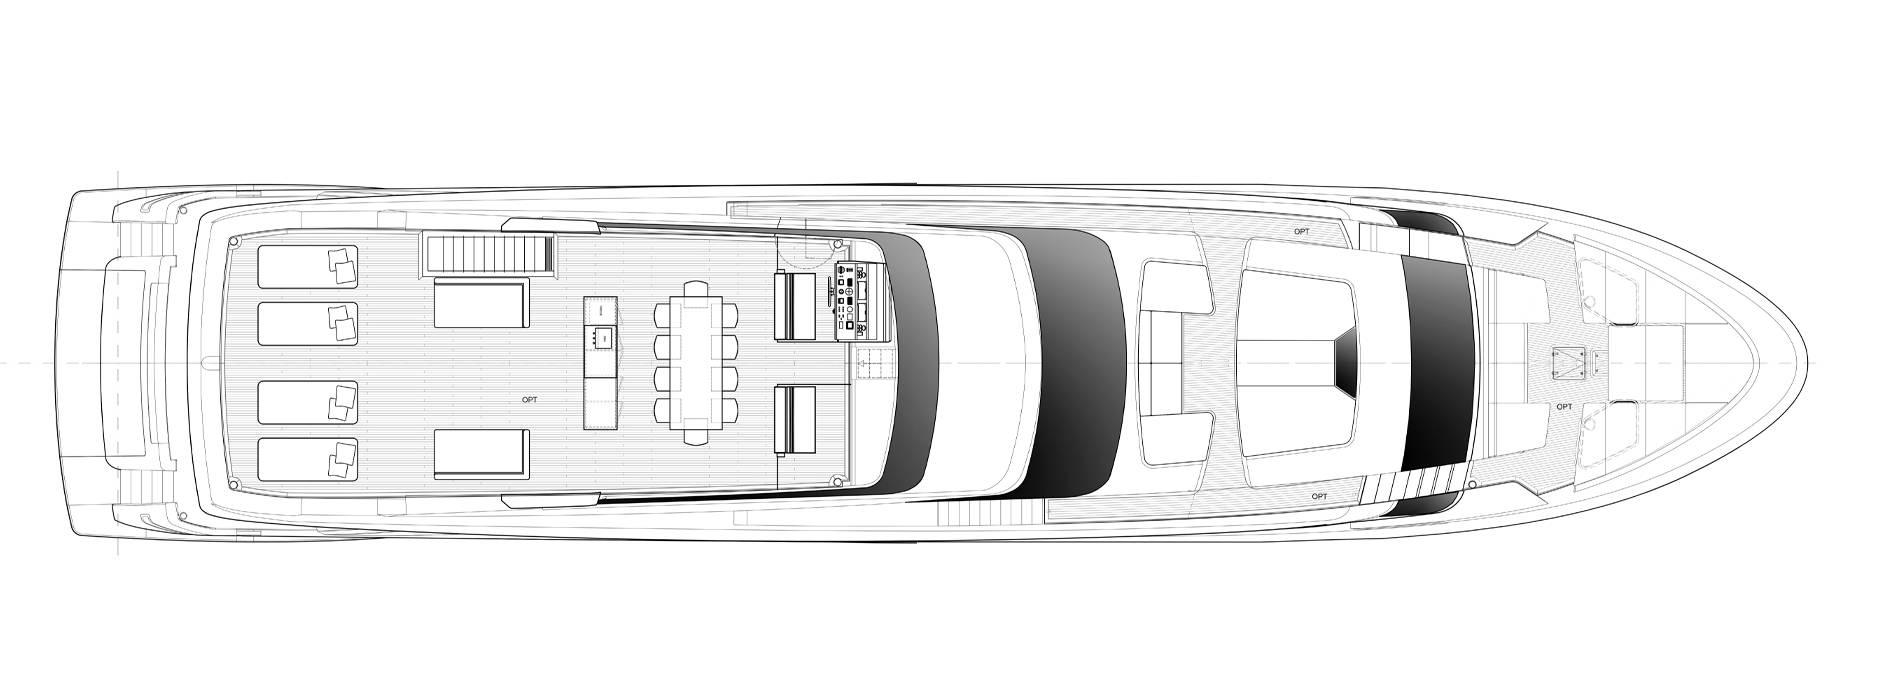 Sanlorenzo Yachts SL120 Asymmetric Flying bridge